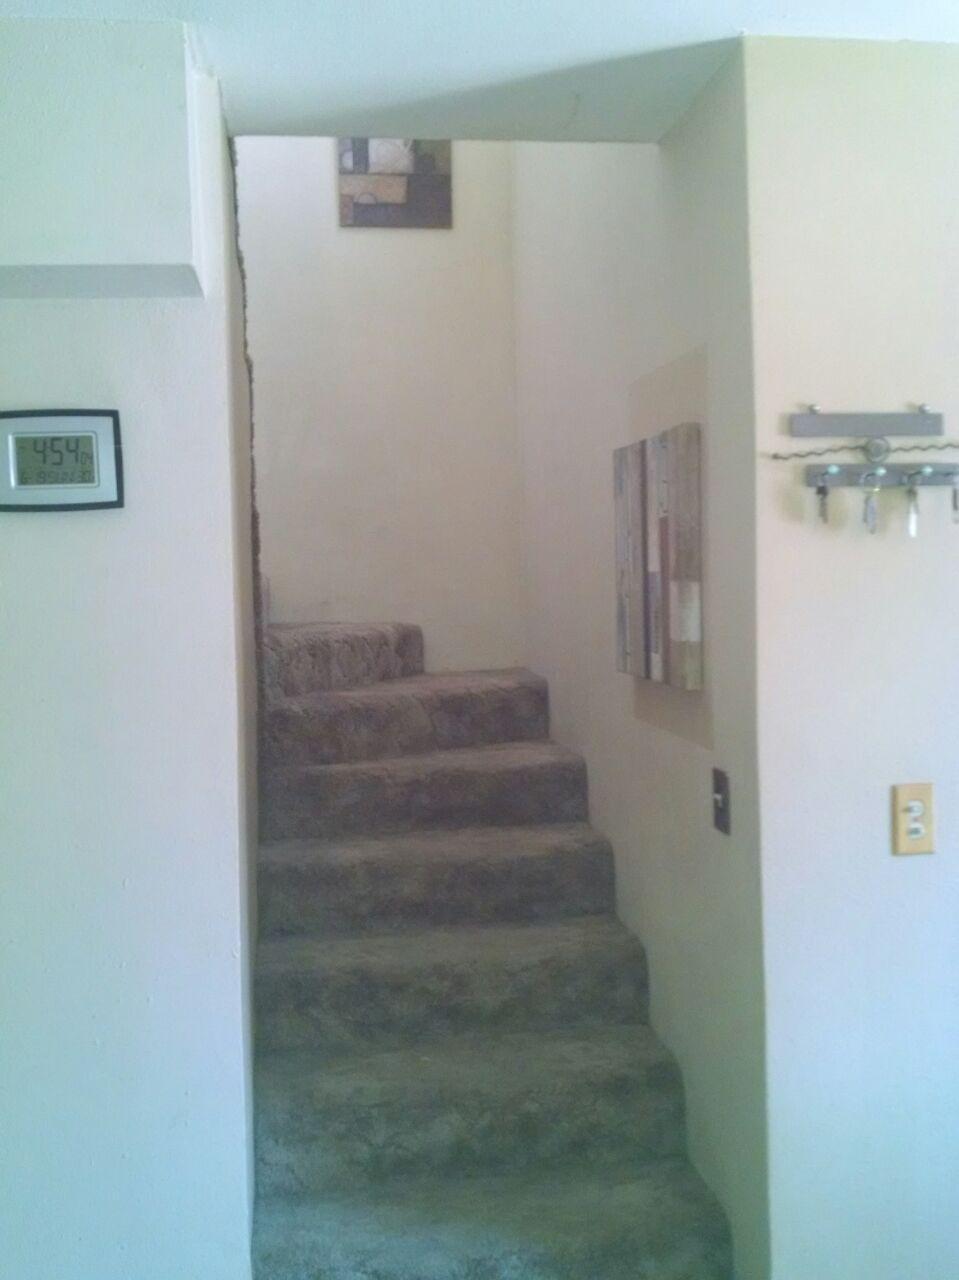 Casa en Renta Brest Este 2937, Fracc. Montecarlo 1, Mexicali, Baja California